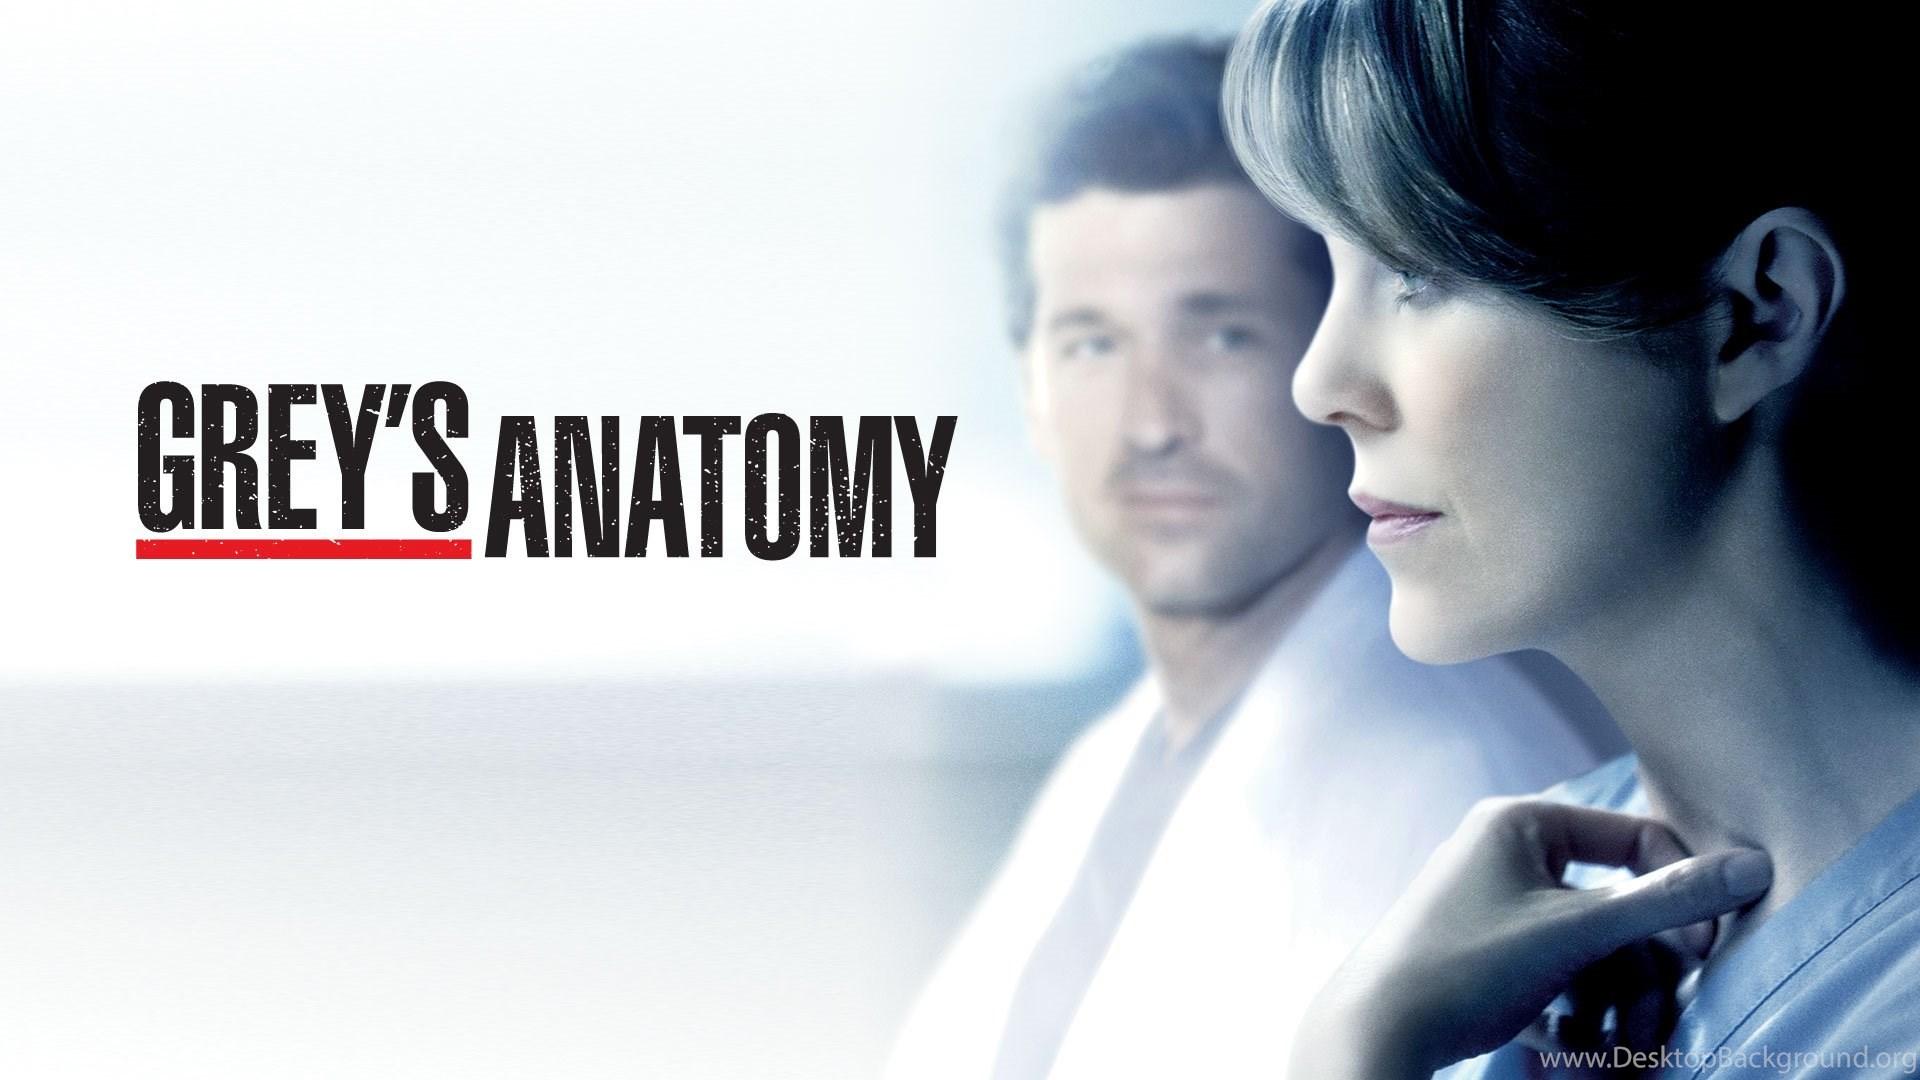 Greys Anatomy Top TV Series Wallpapers HD. Free Desktop Backgrounds ...